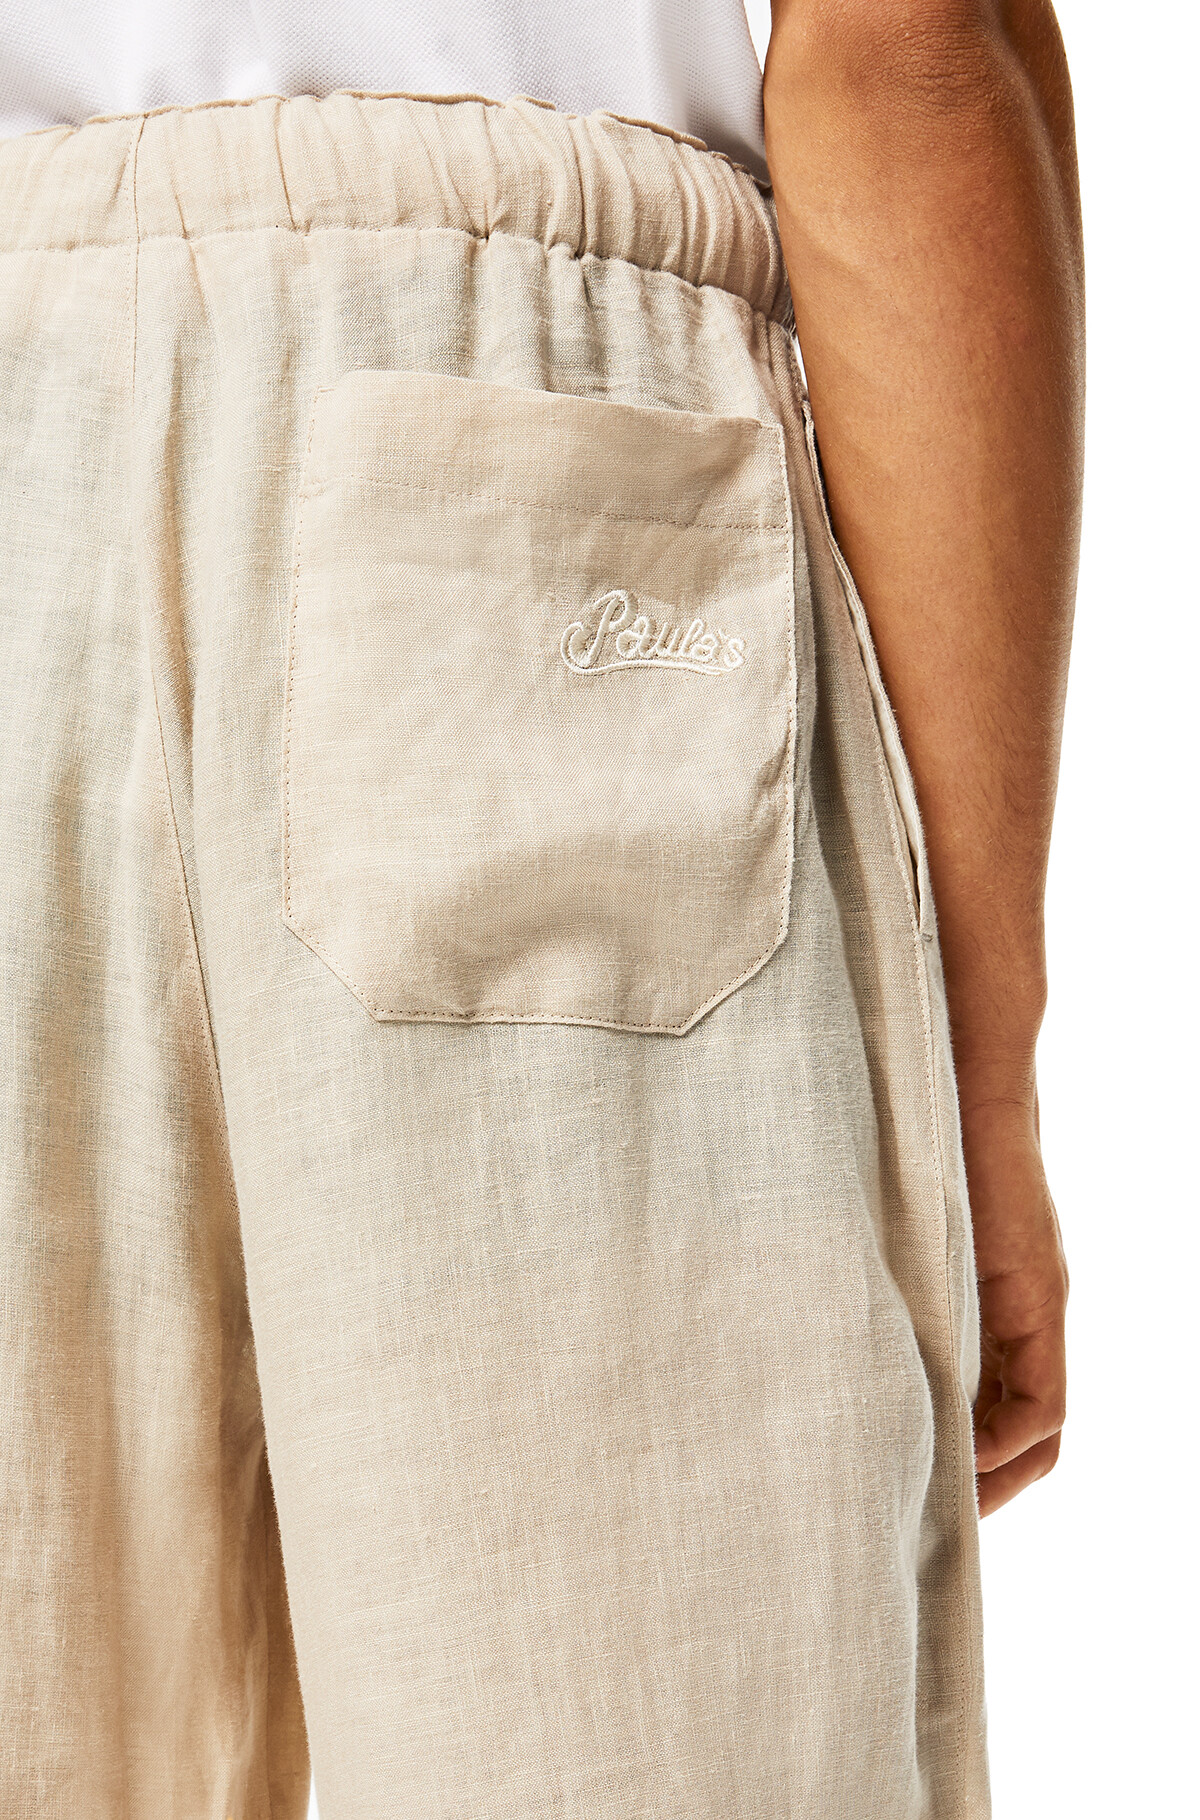 LOEWE Trousers In Linen Beige front